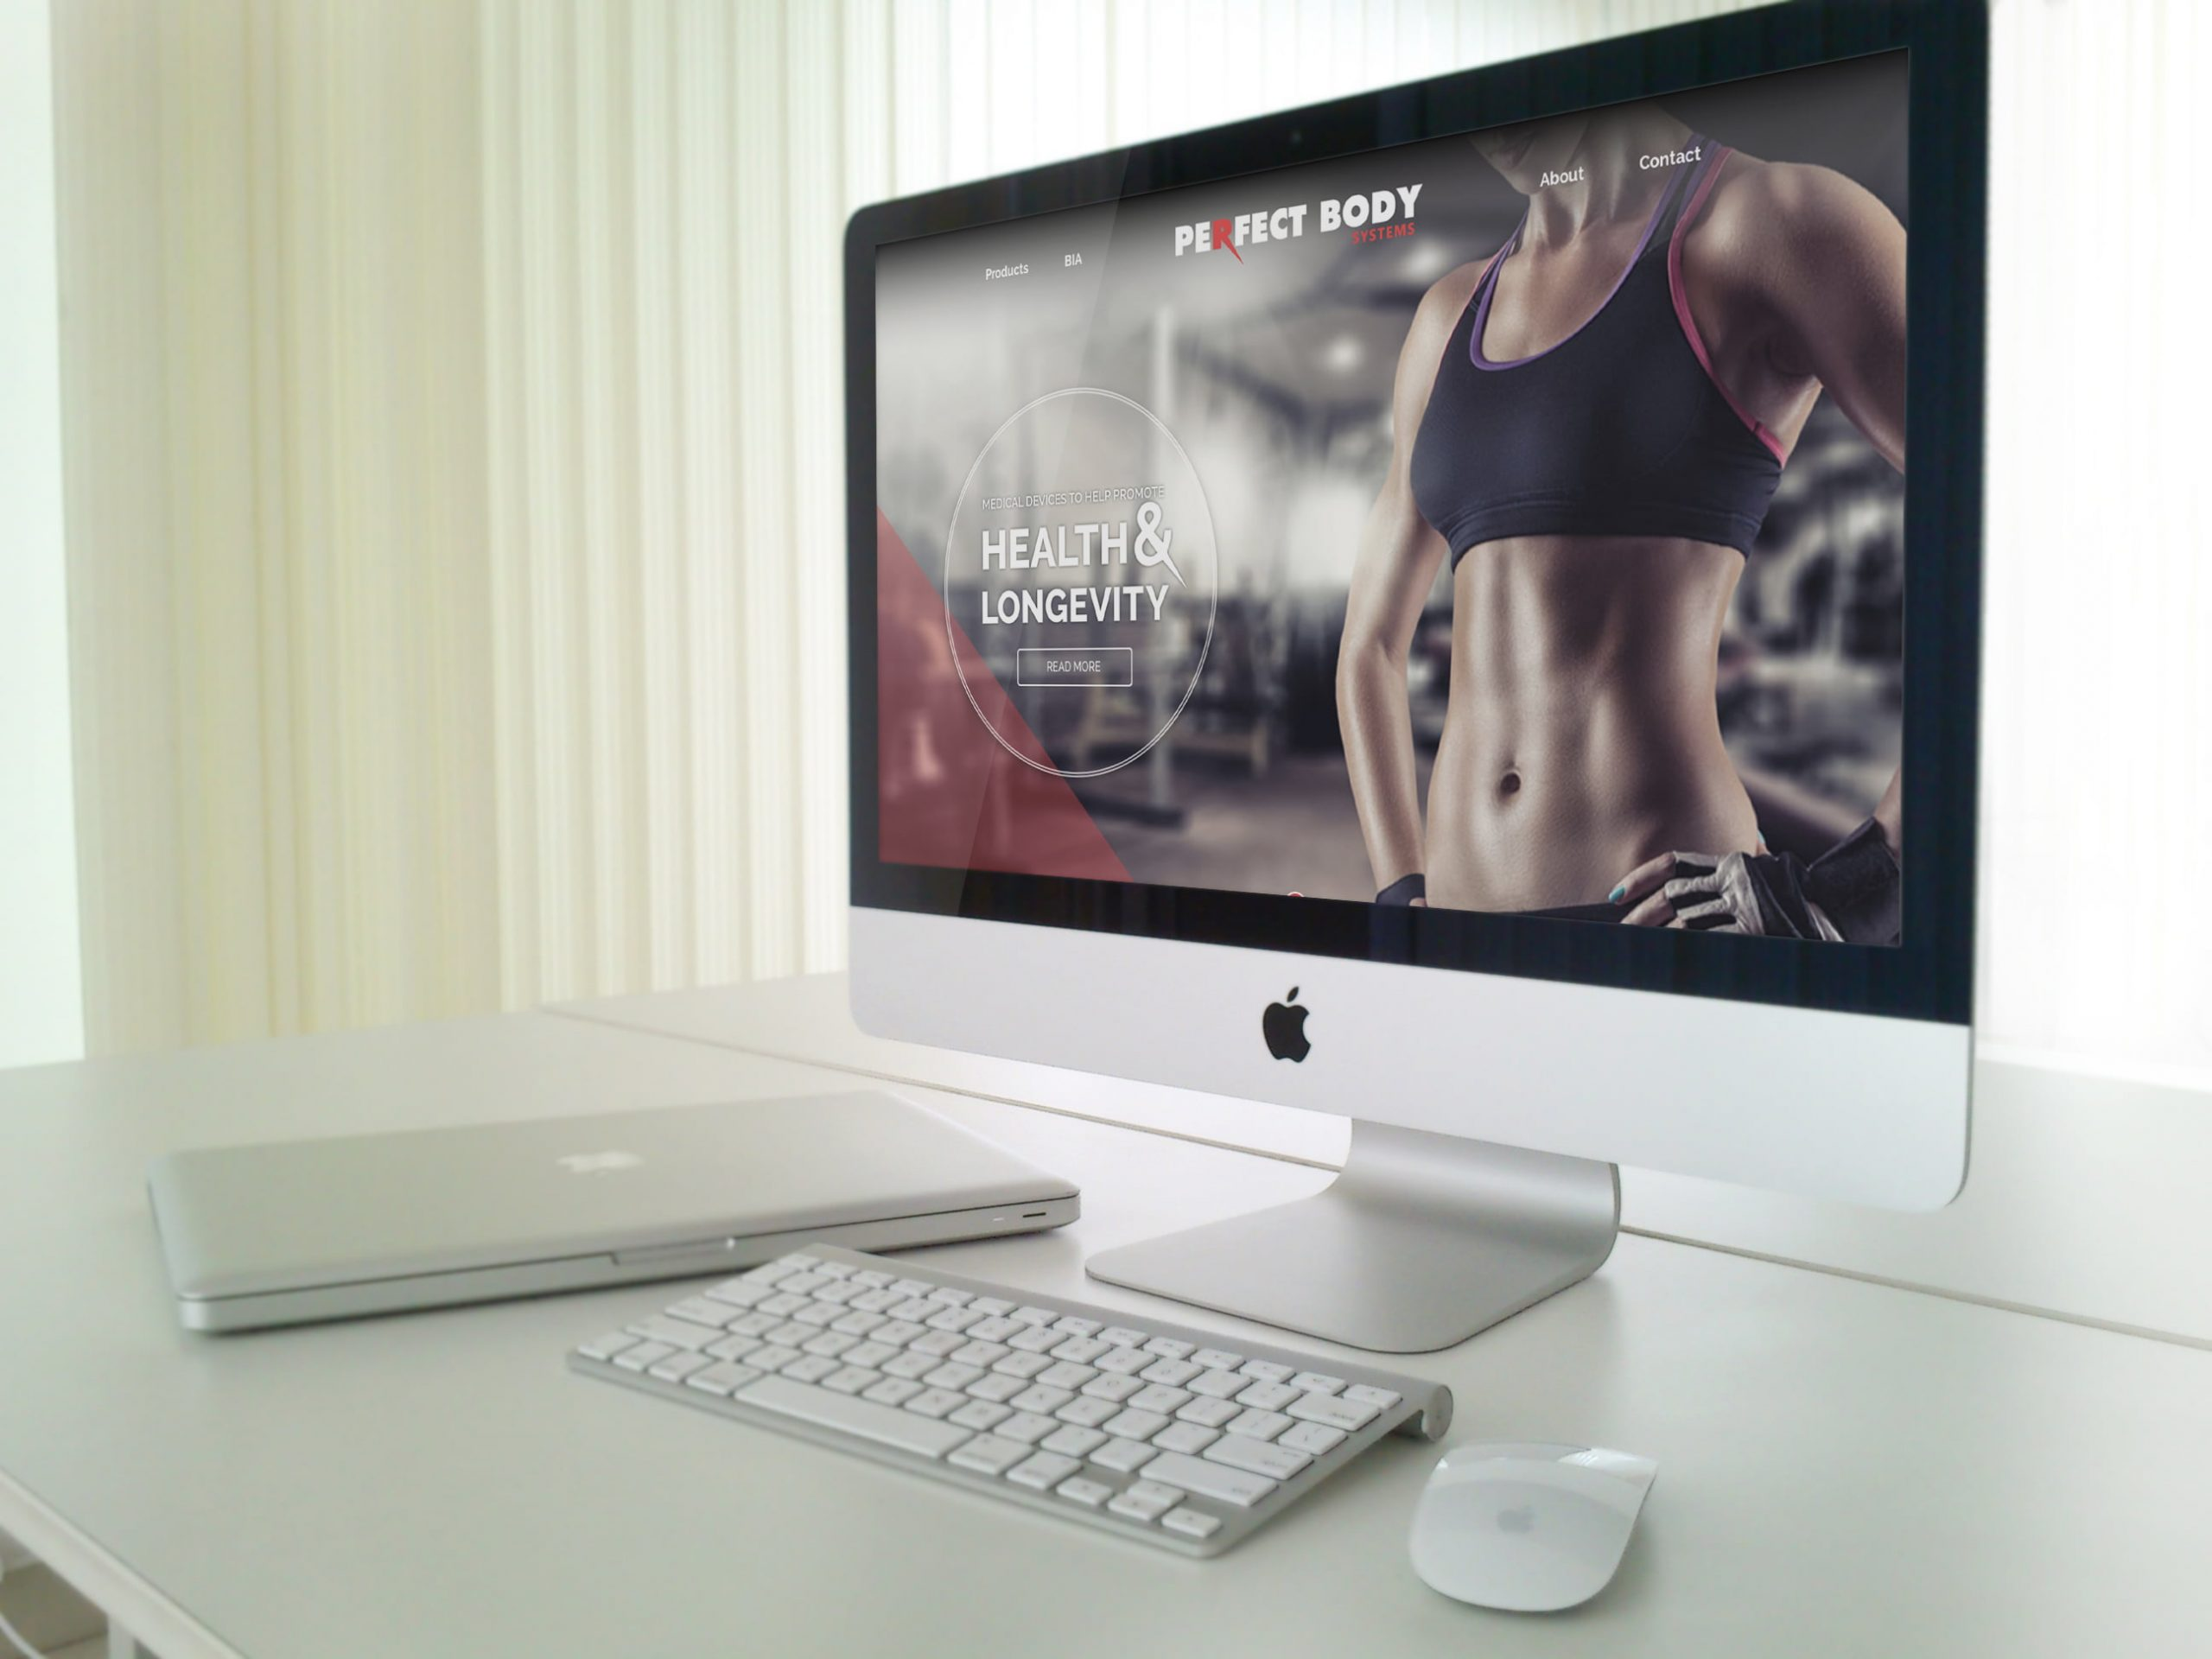 Perfect Body website displayed on Mac desktop